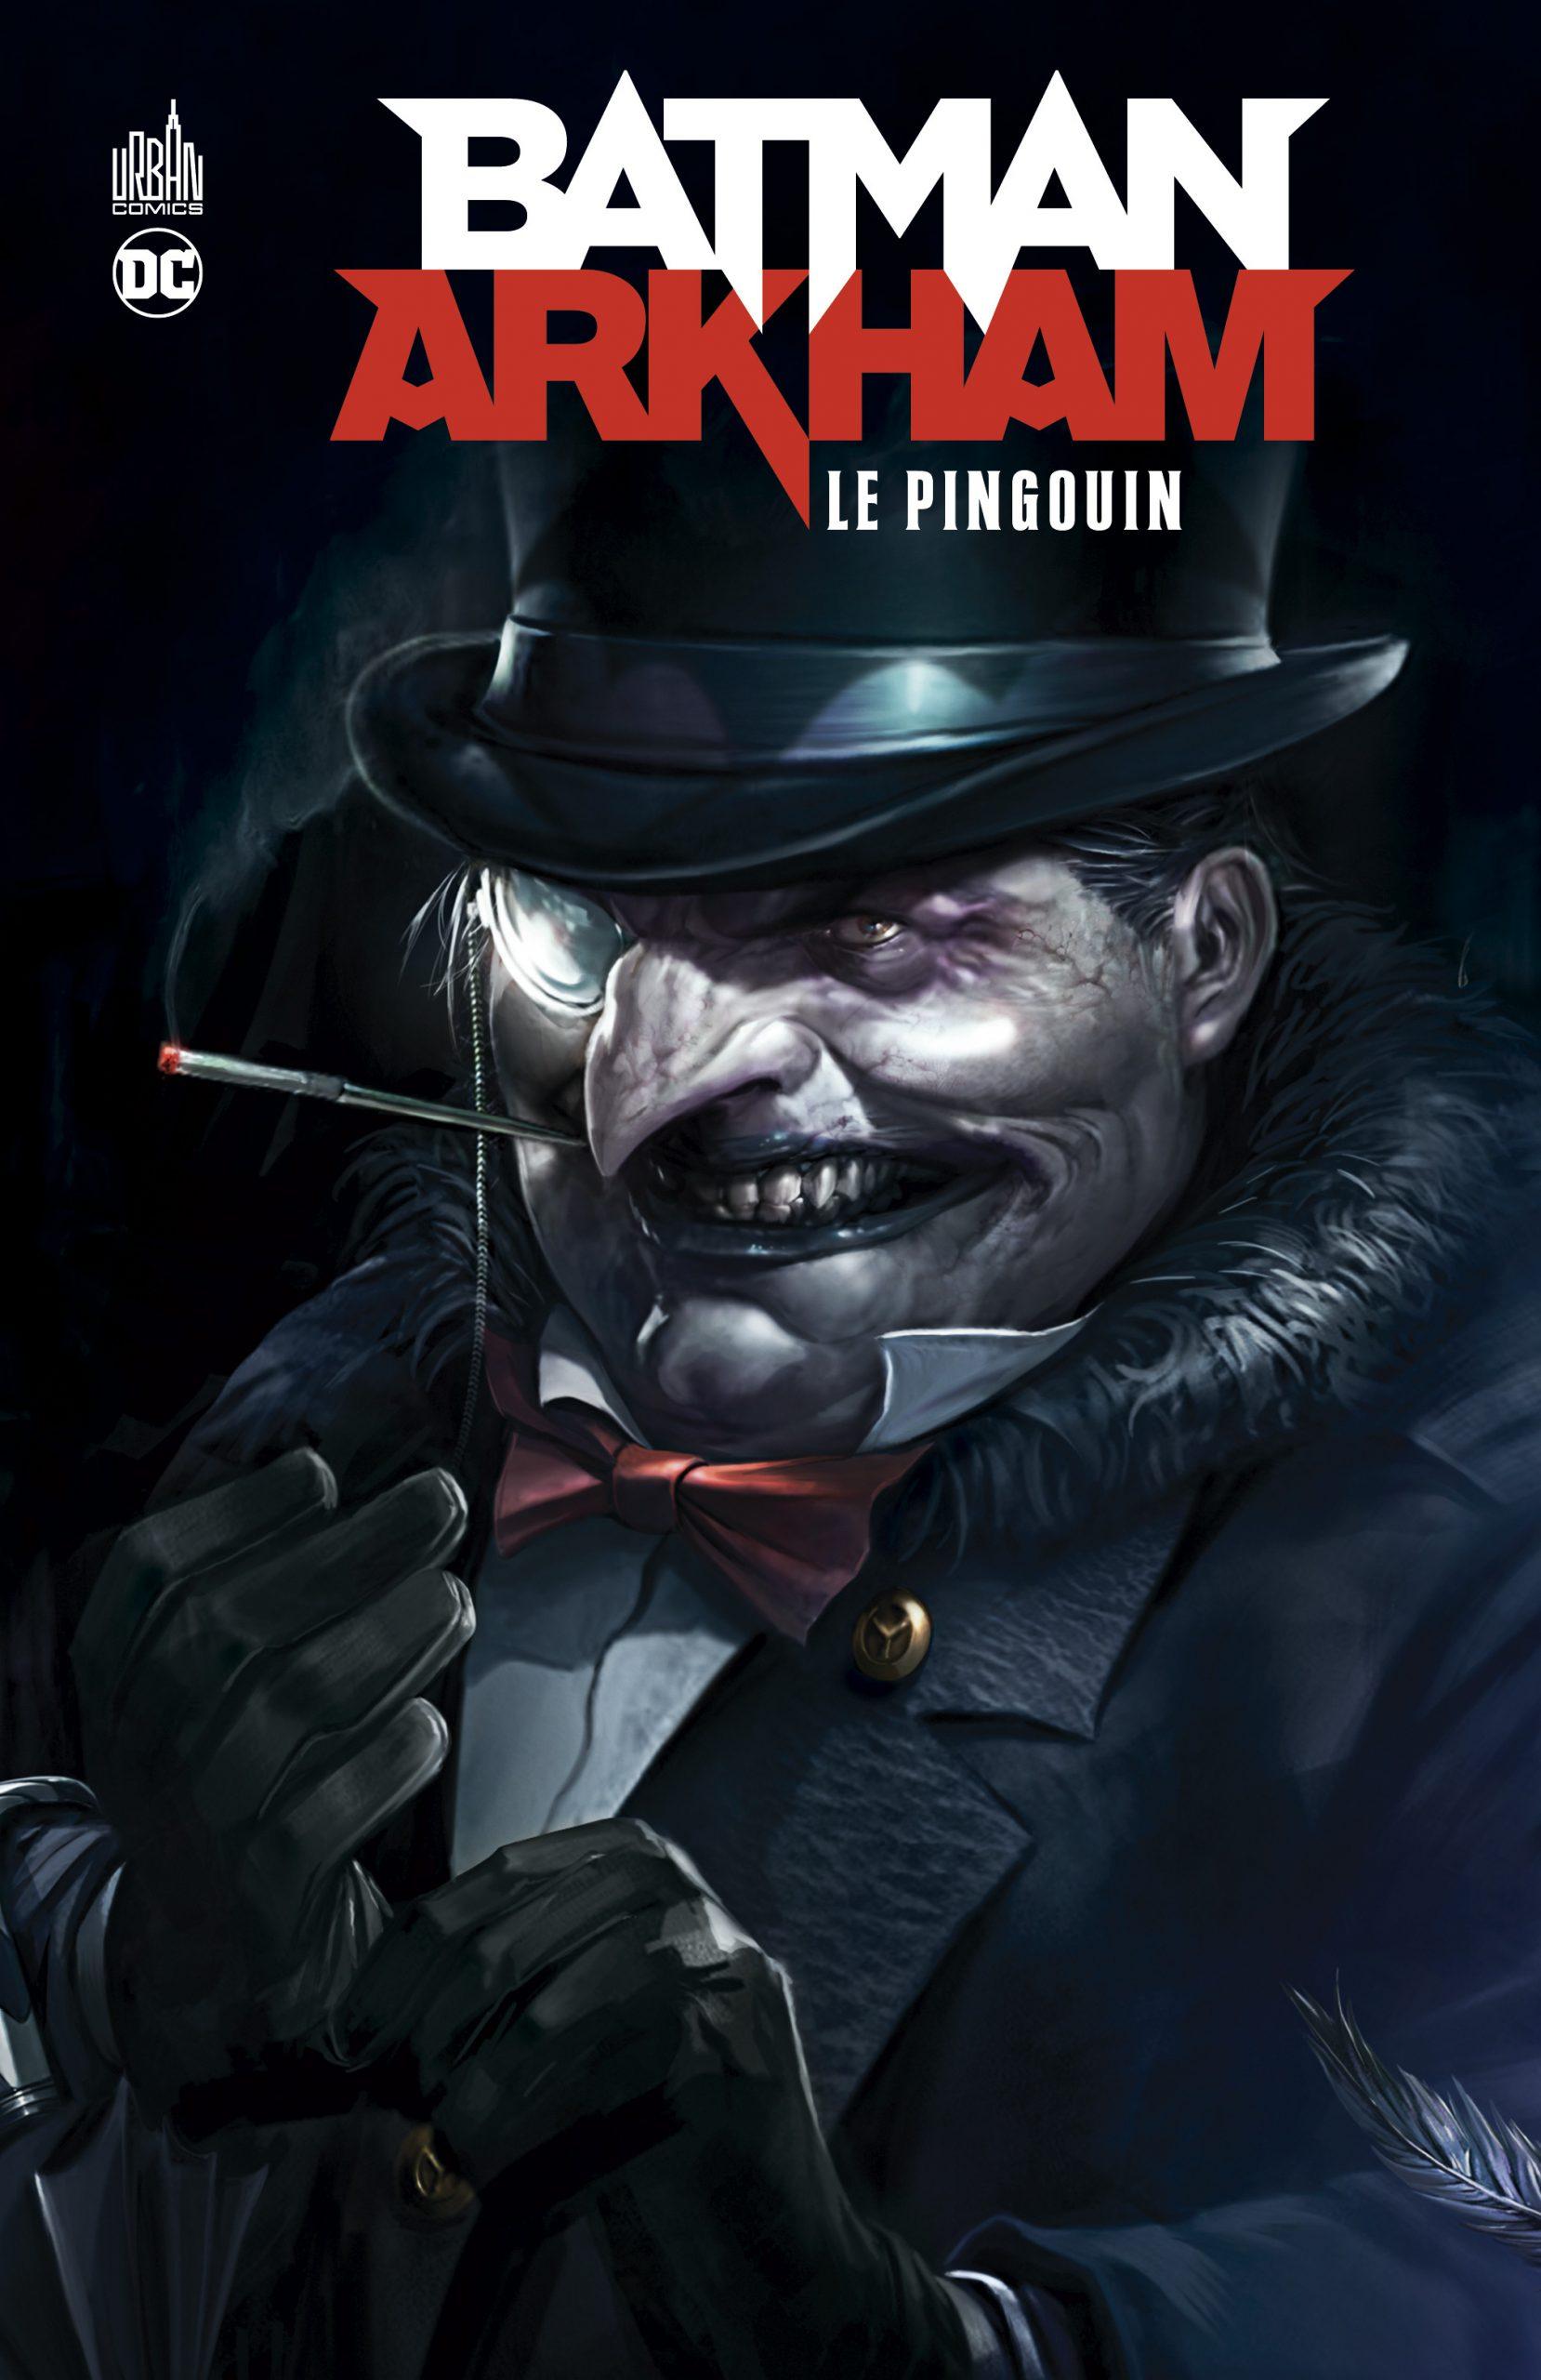 BATMAN ARKHAM - TOME 3 LE PINGOUIN